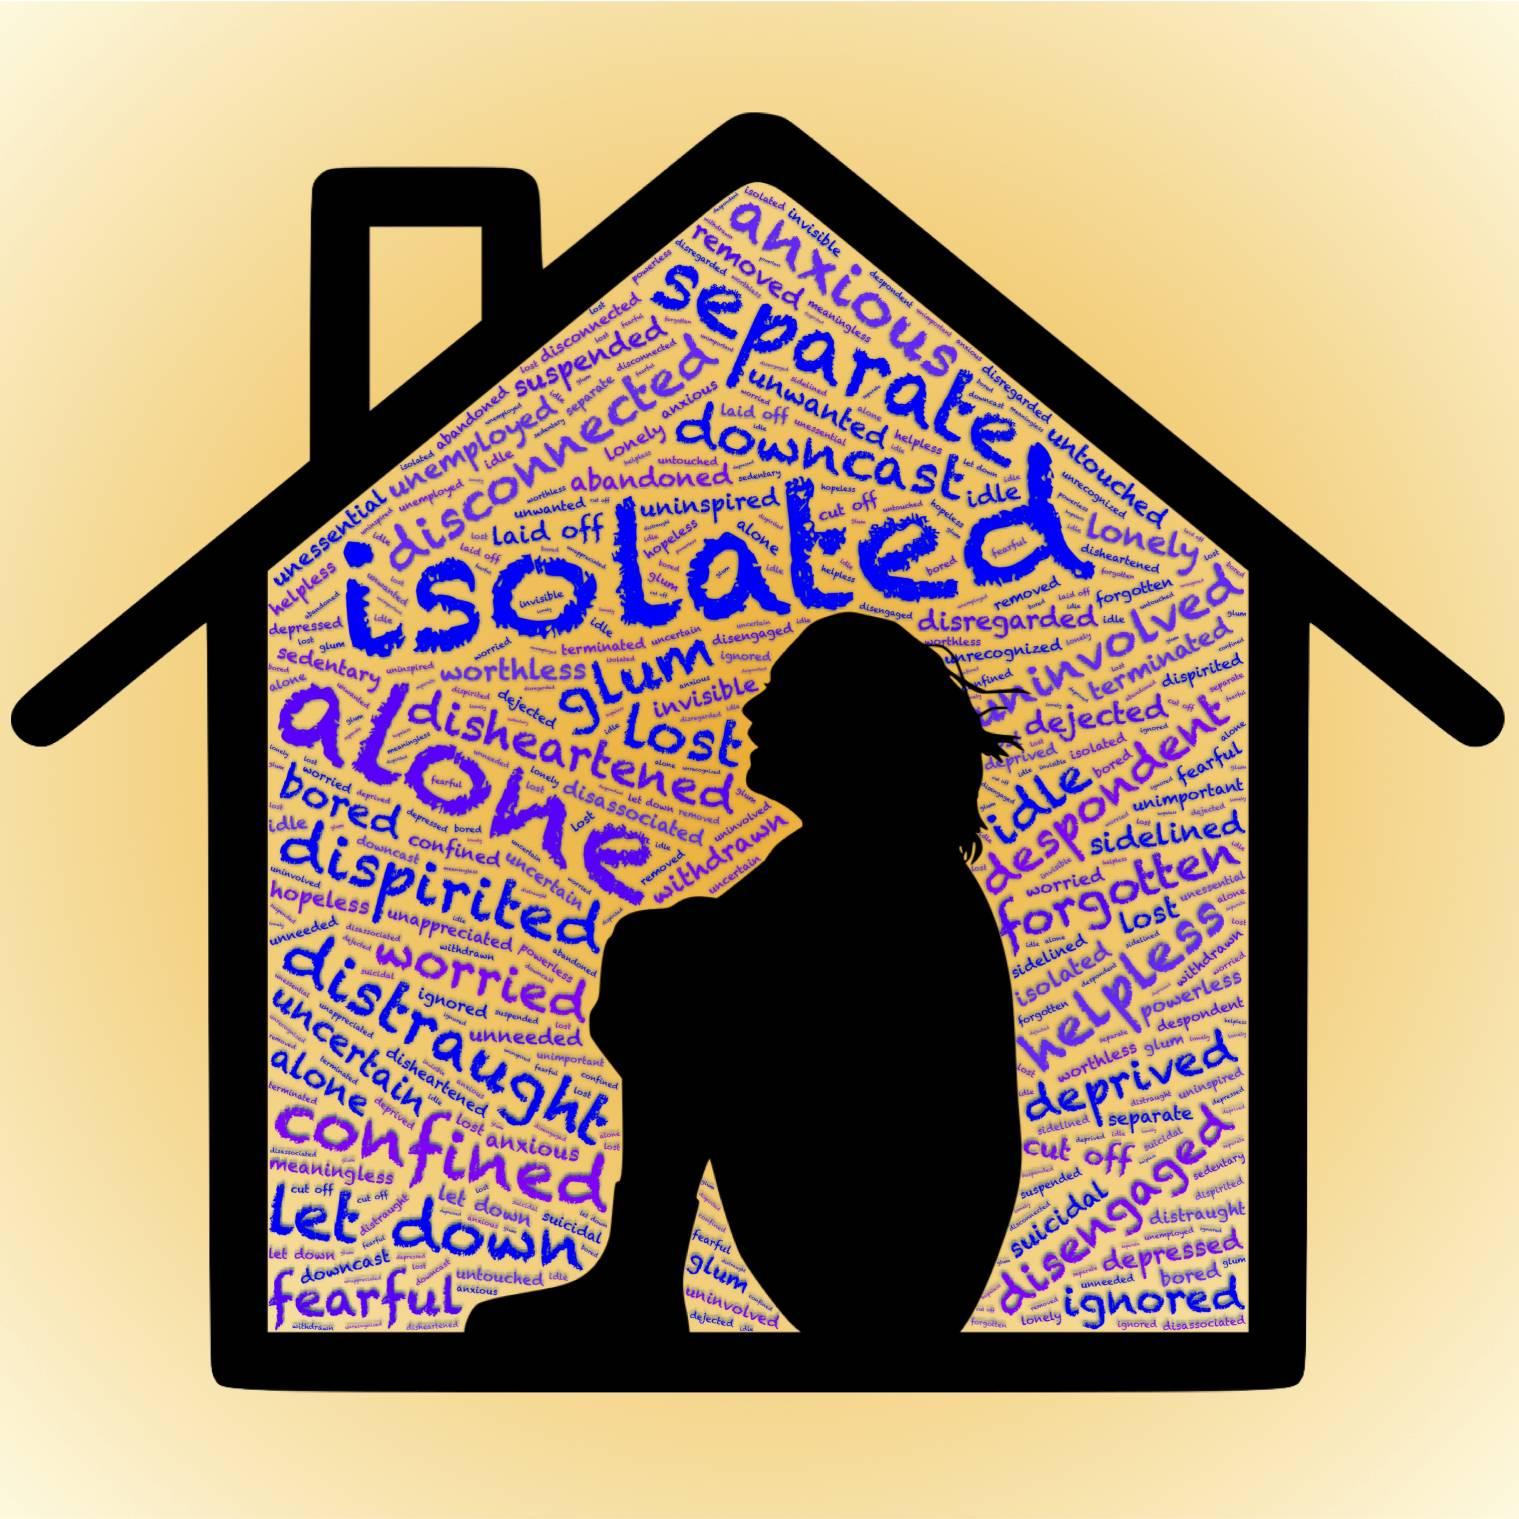 isolation-illustration